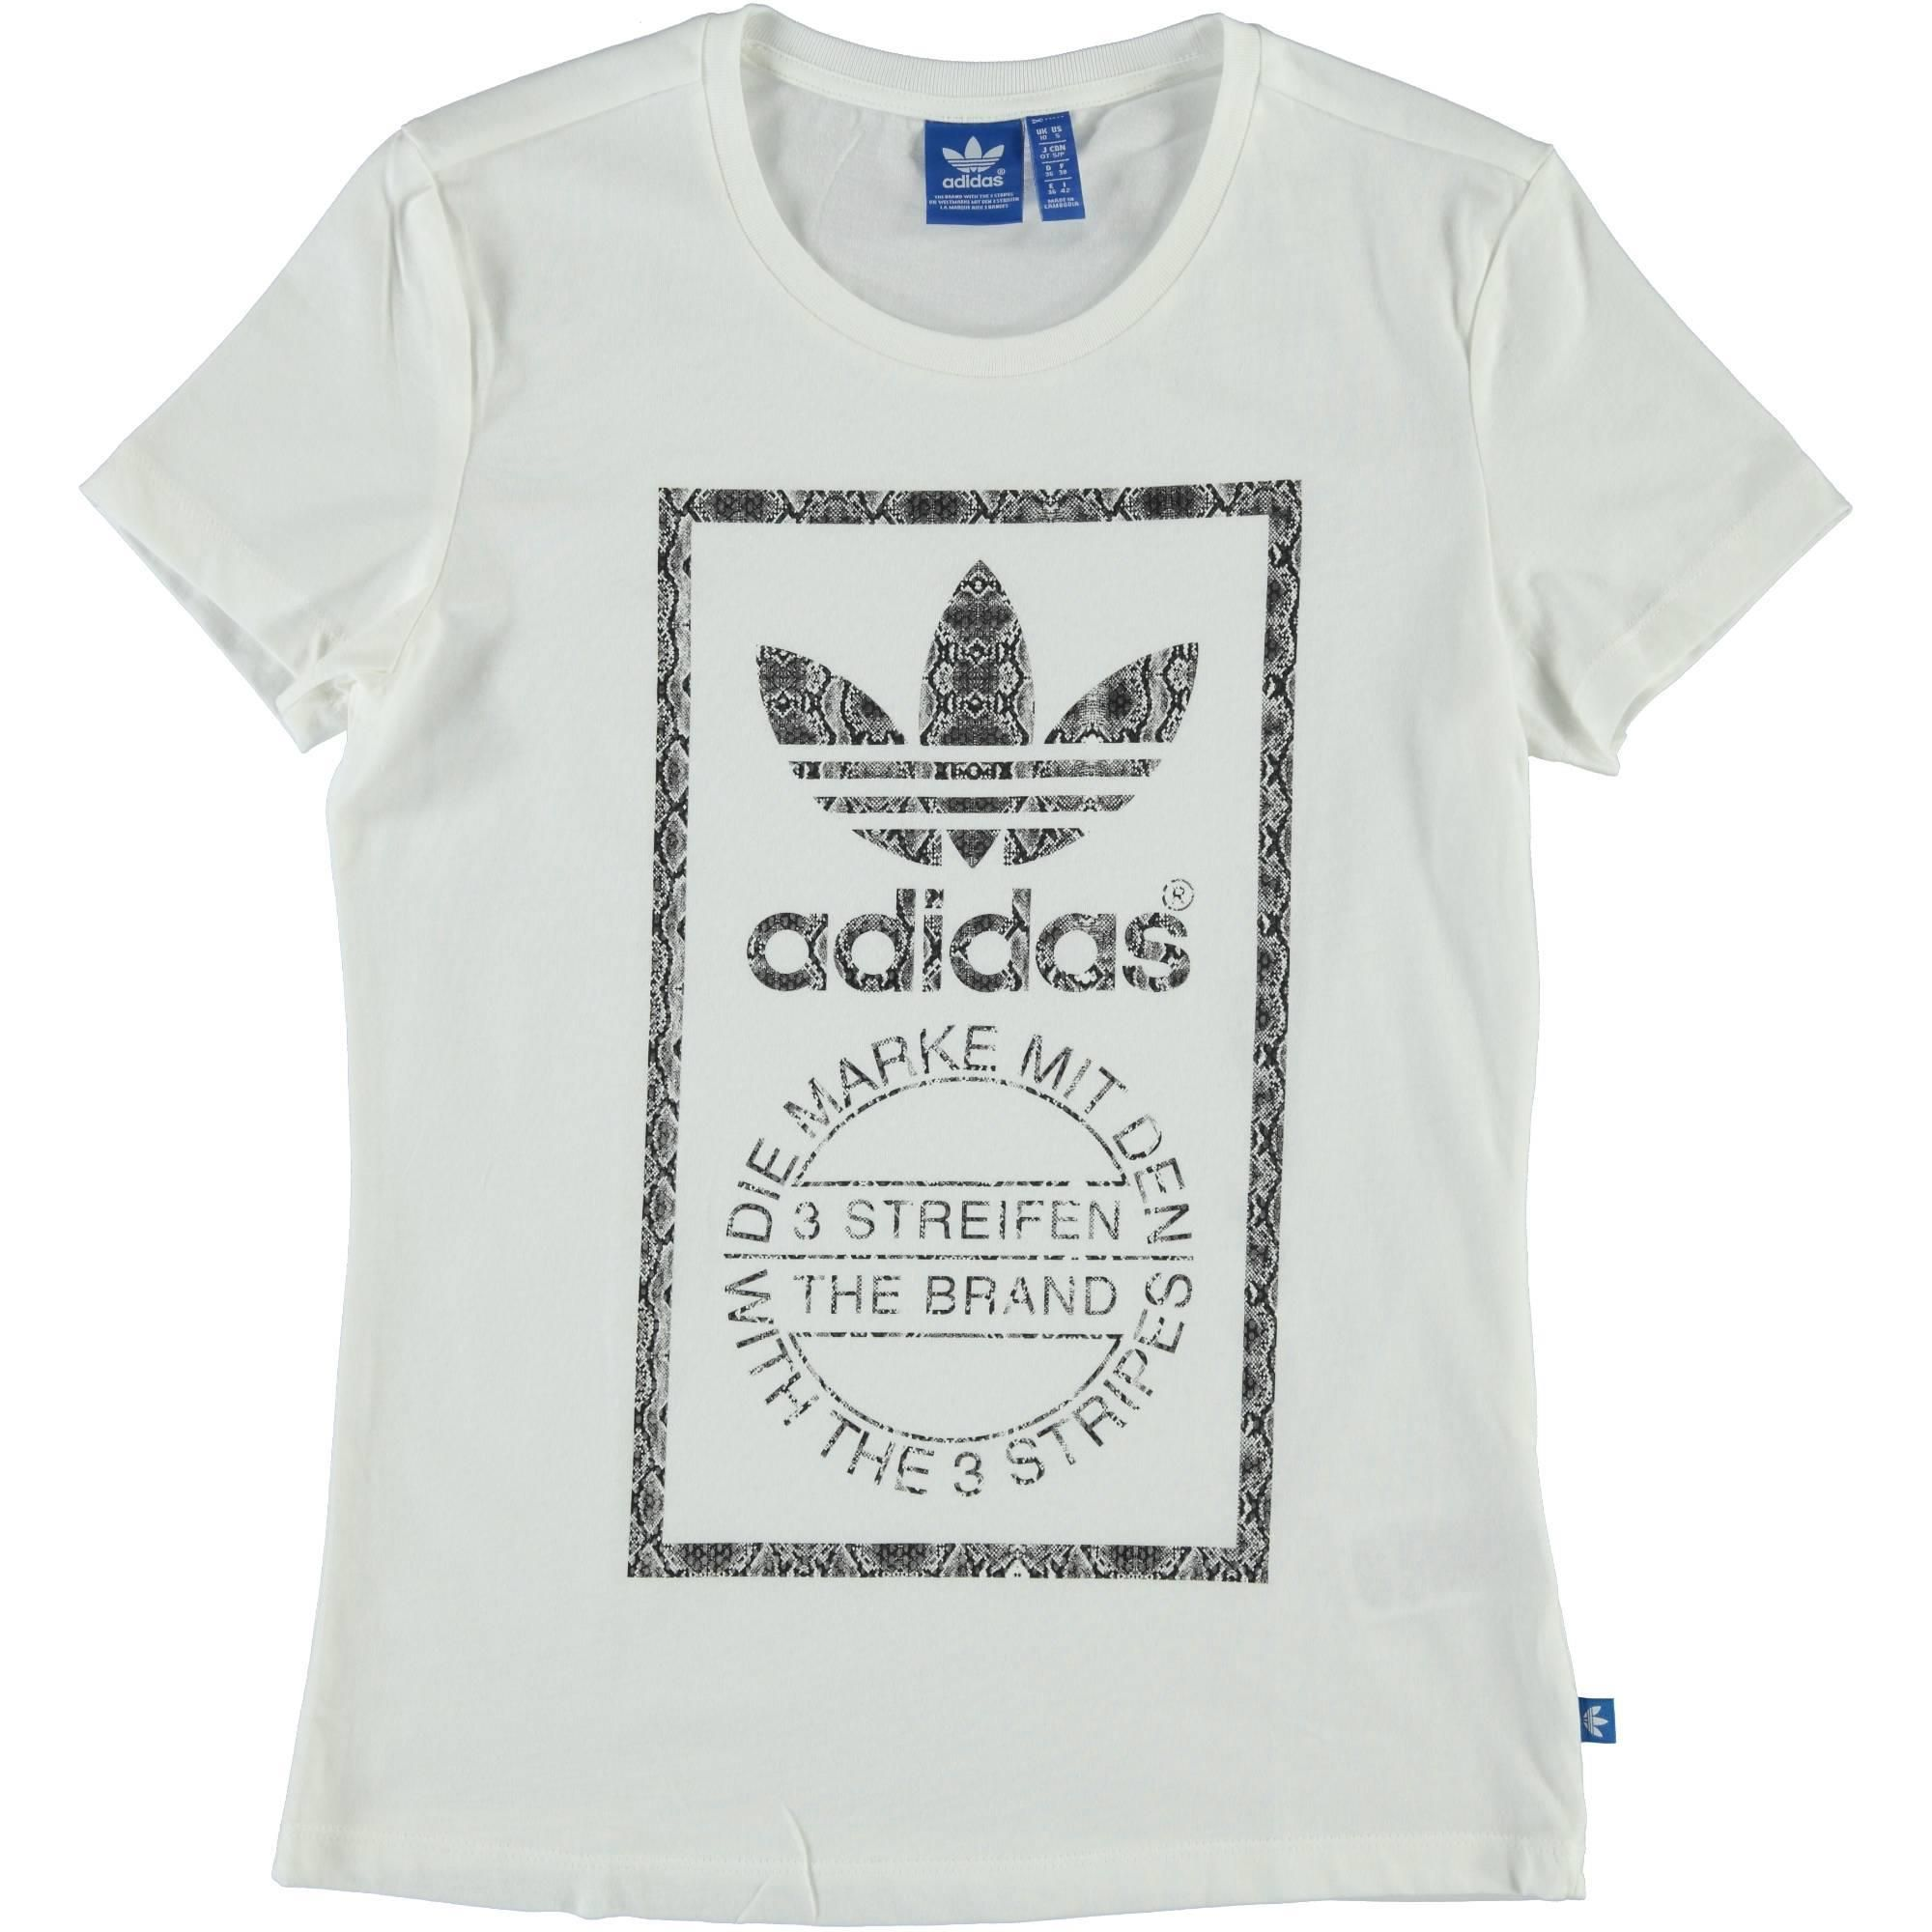 T shirt bianca con logo Adidas stam donna - € 24,90 | Nico.it - #nico #nicoabbigliamentocalzature #sport #fitness #black #newarrival #newcollection #adidas #adidasessential